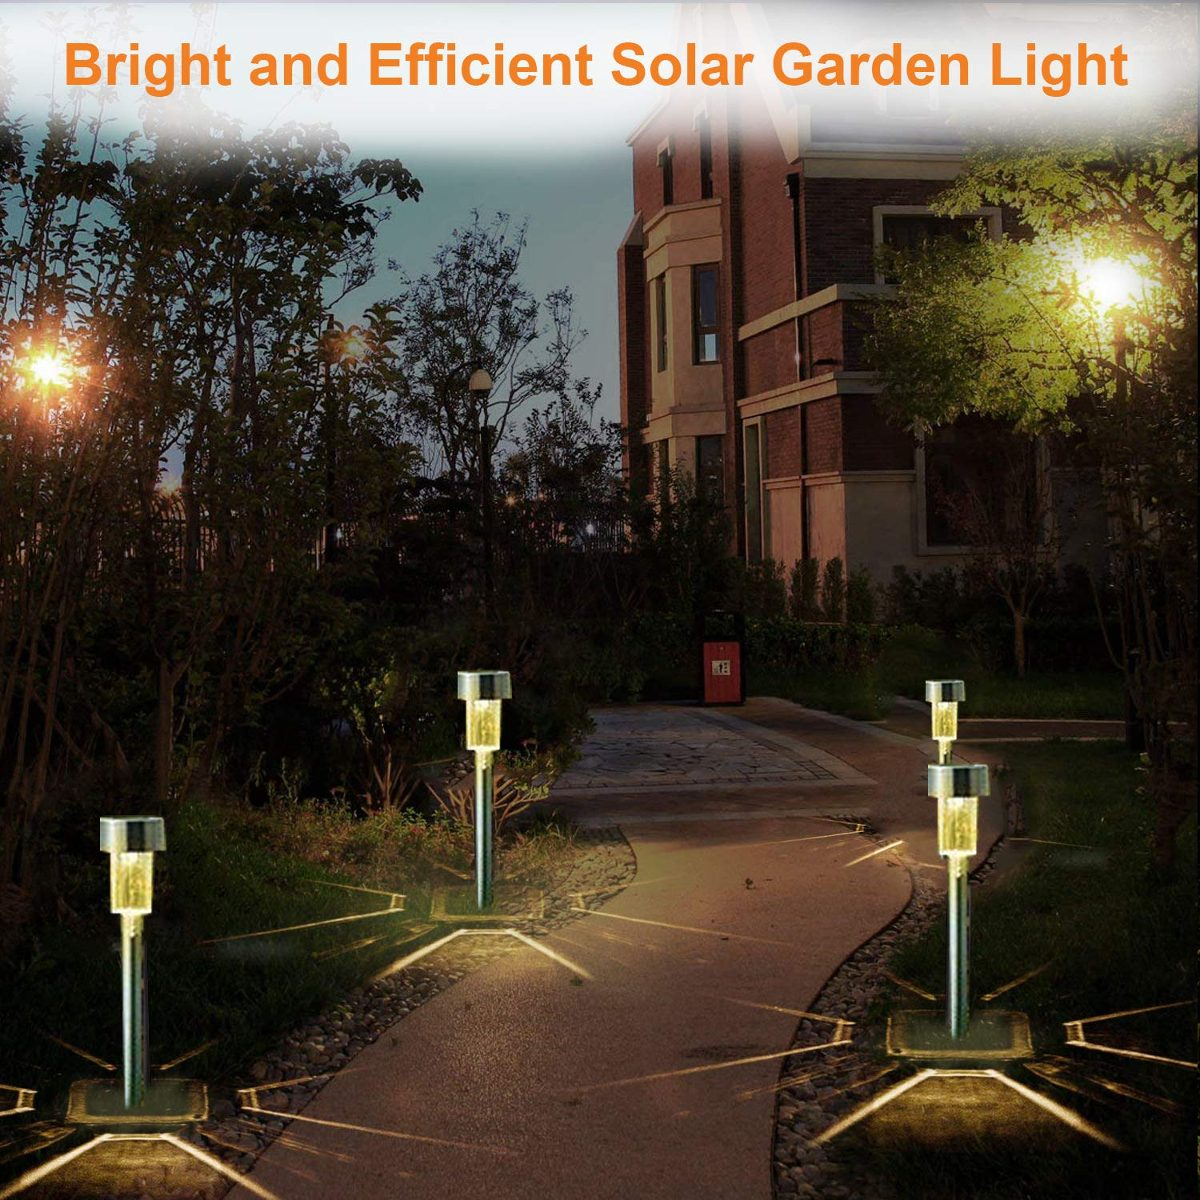 Solar Lights Outdoor Solar Driveway Lights 12pack Stainless 46 900 En Mercado Libre